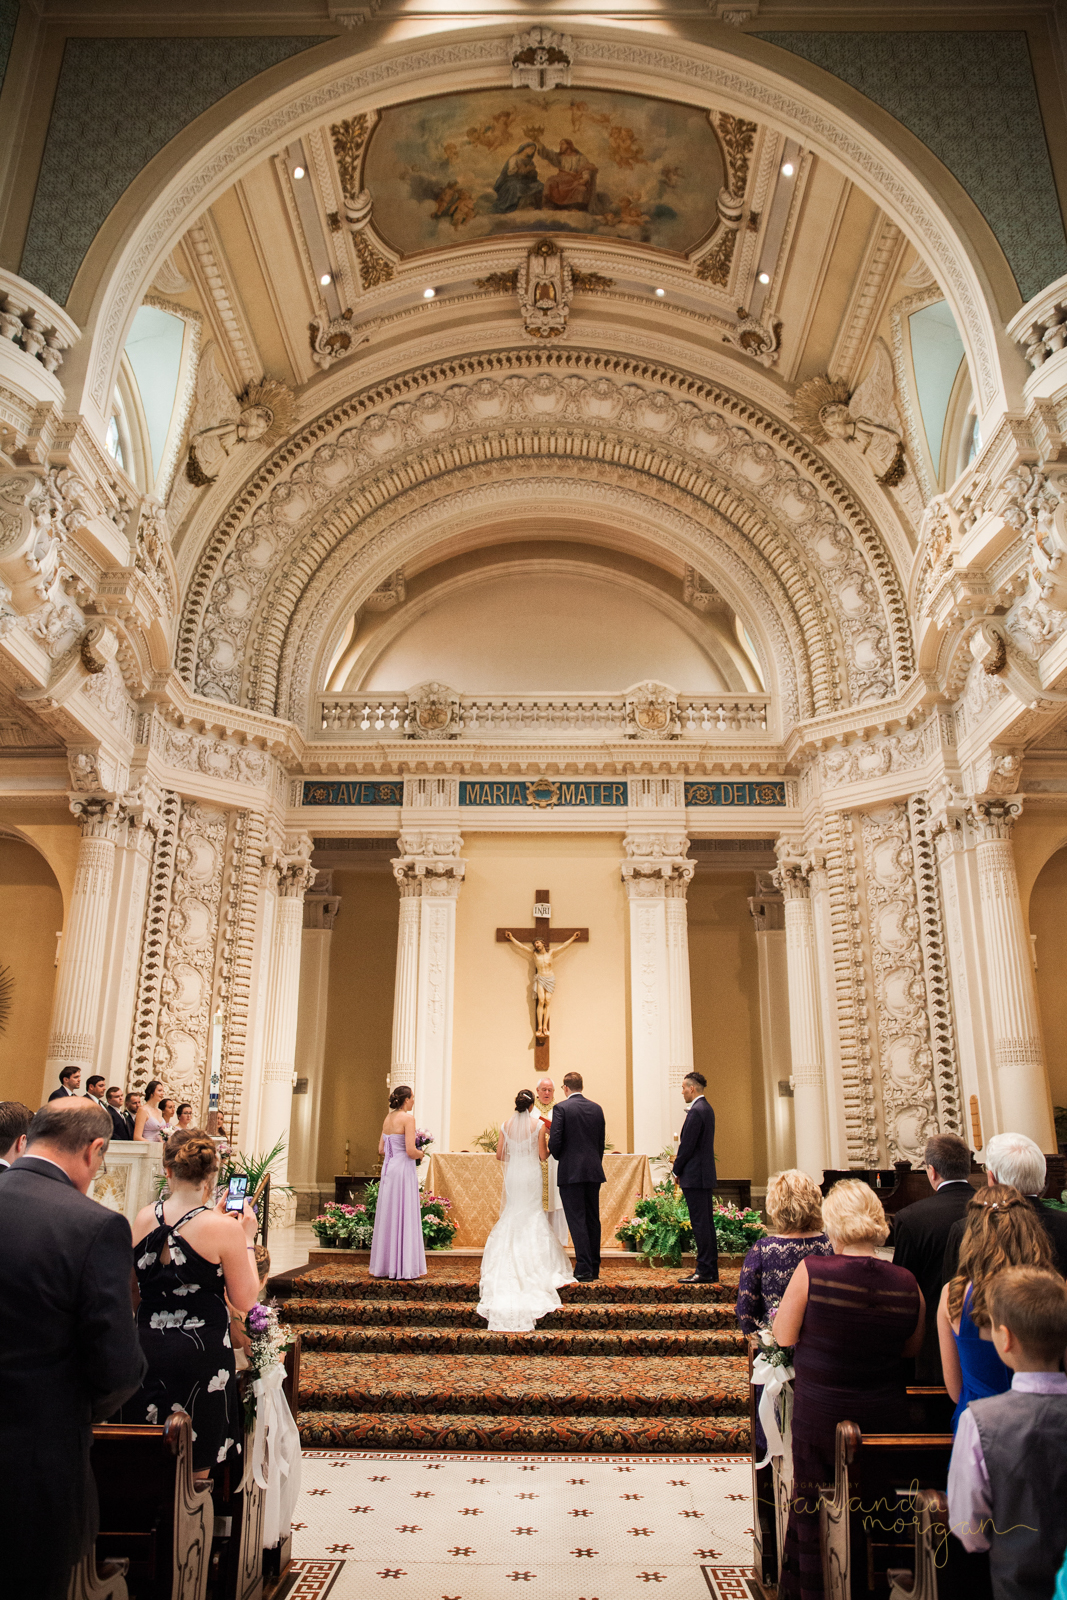 Notre-Dame-Catholic-Church-Wedding-Amanda-Morgan-5.jpg